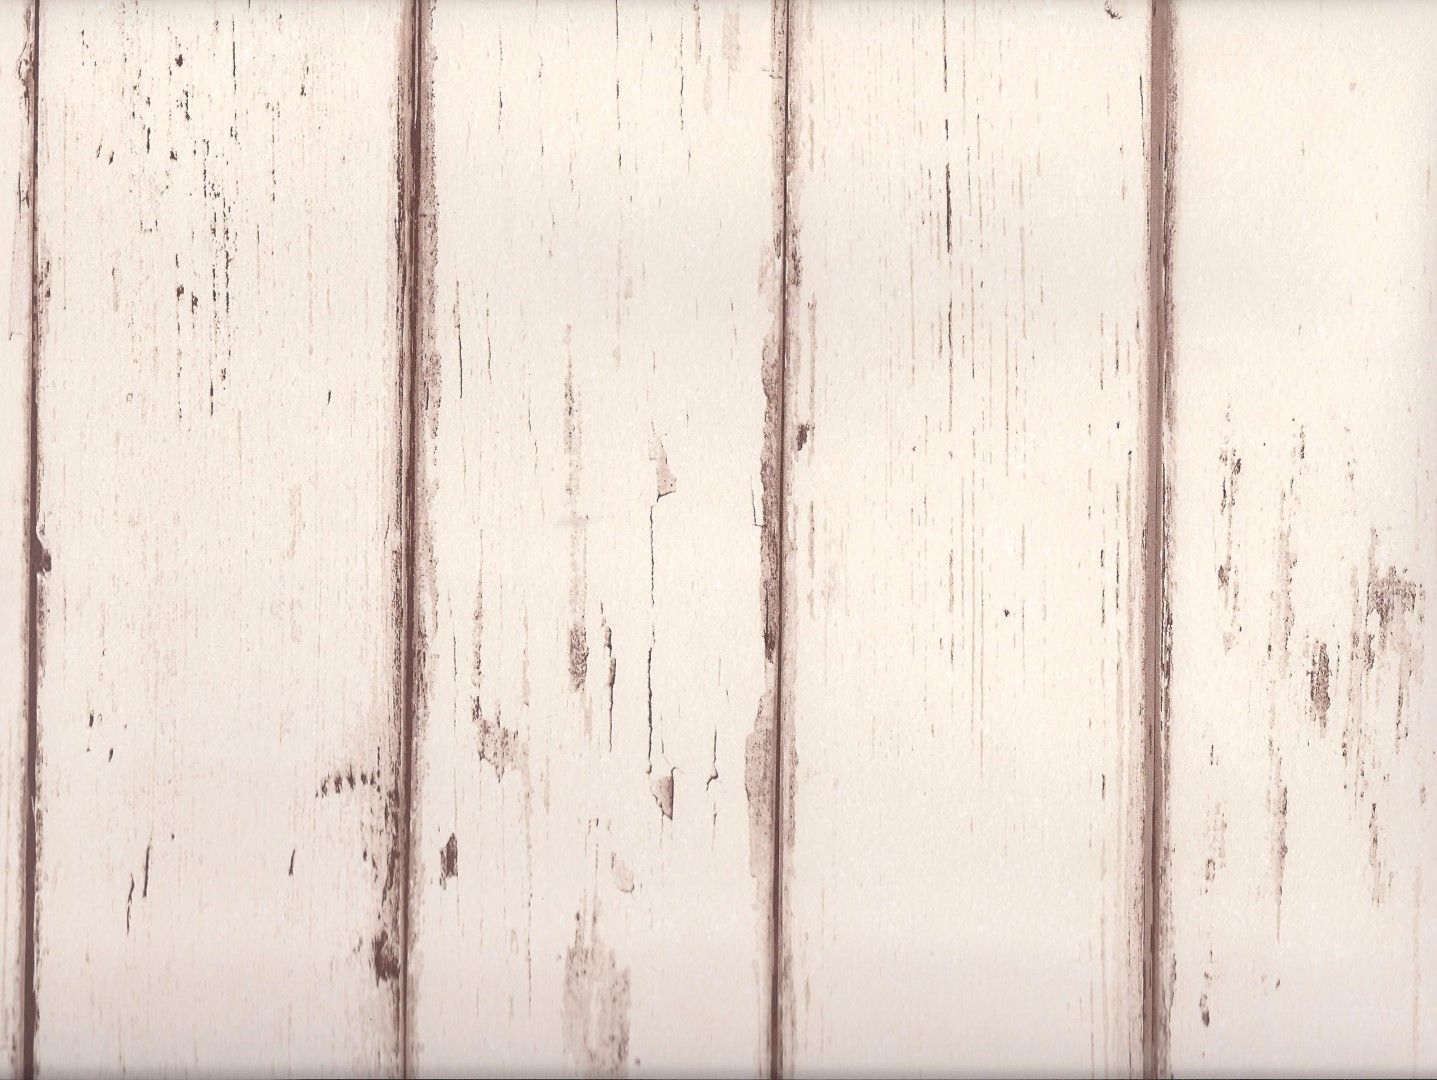 Rustic Dark Brown Cream Wood Slats Diana S Paint And Wallpaper Inc Wood Slats Wallpaper Prepasted Wallpaper